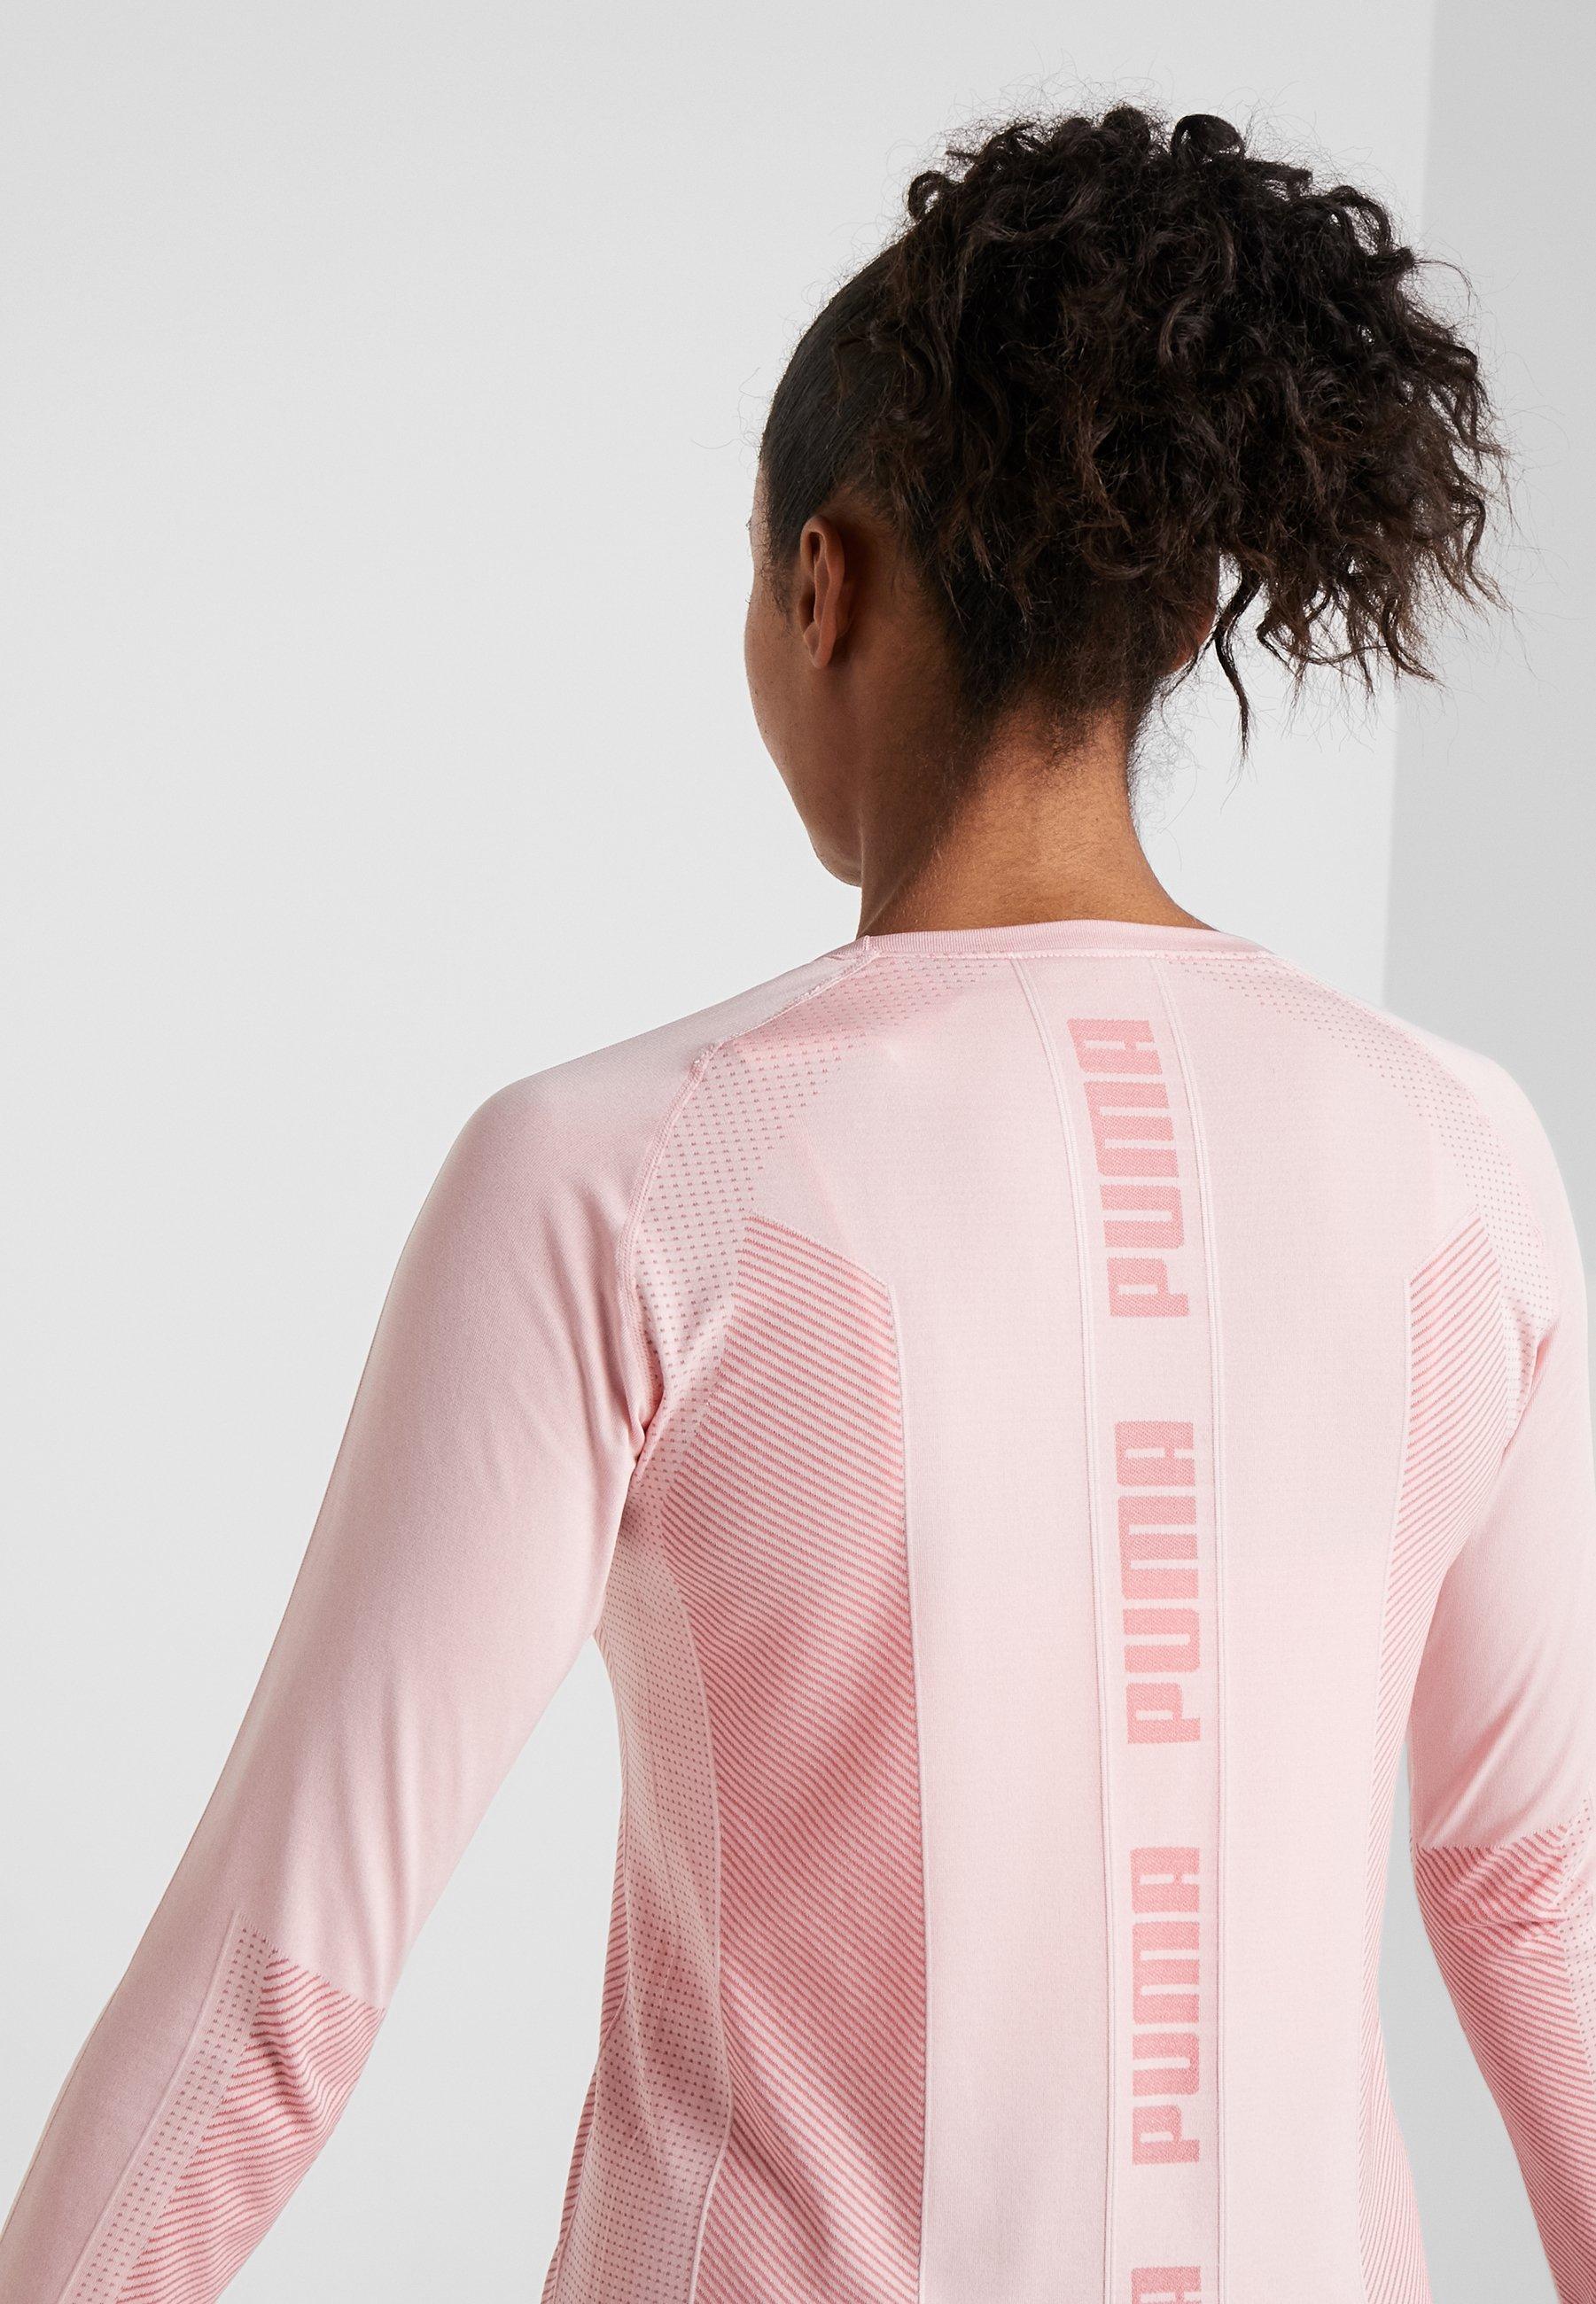 Manches Evoknit TopT shirt Puma À Rose Seamless Longues Bridal kwXiOPuTZ